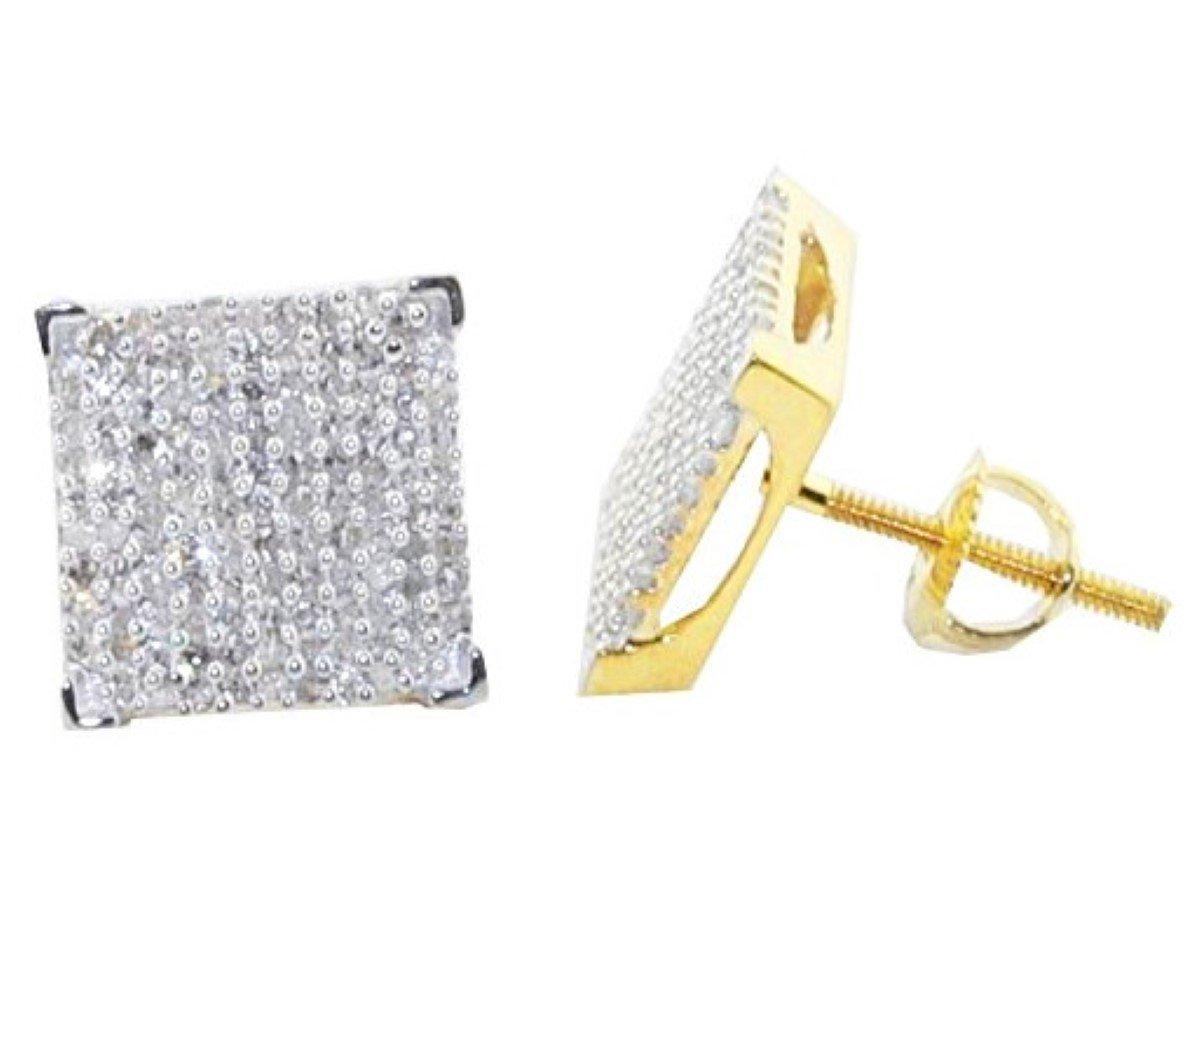 10mm Wide Diamond Earrings 1/2cttw 10k Yellow Gold Square Shaped Screw Back(i3, J/k)